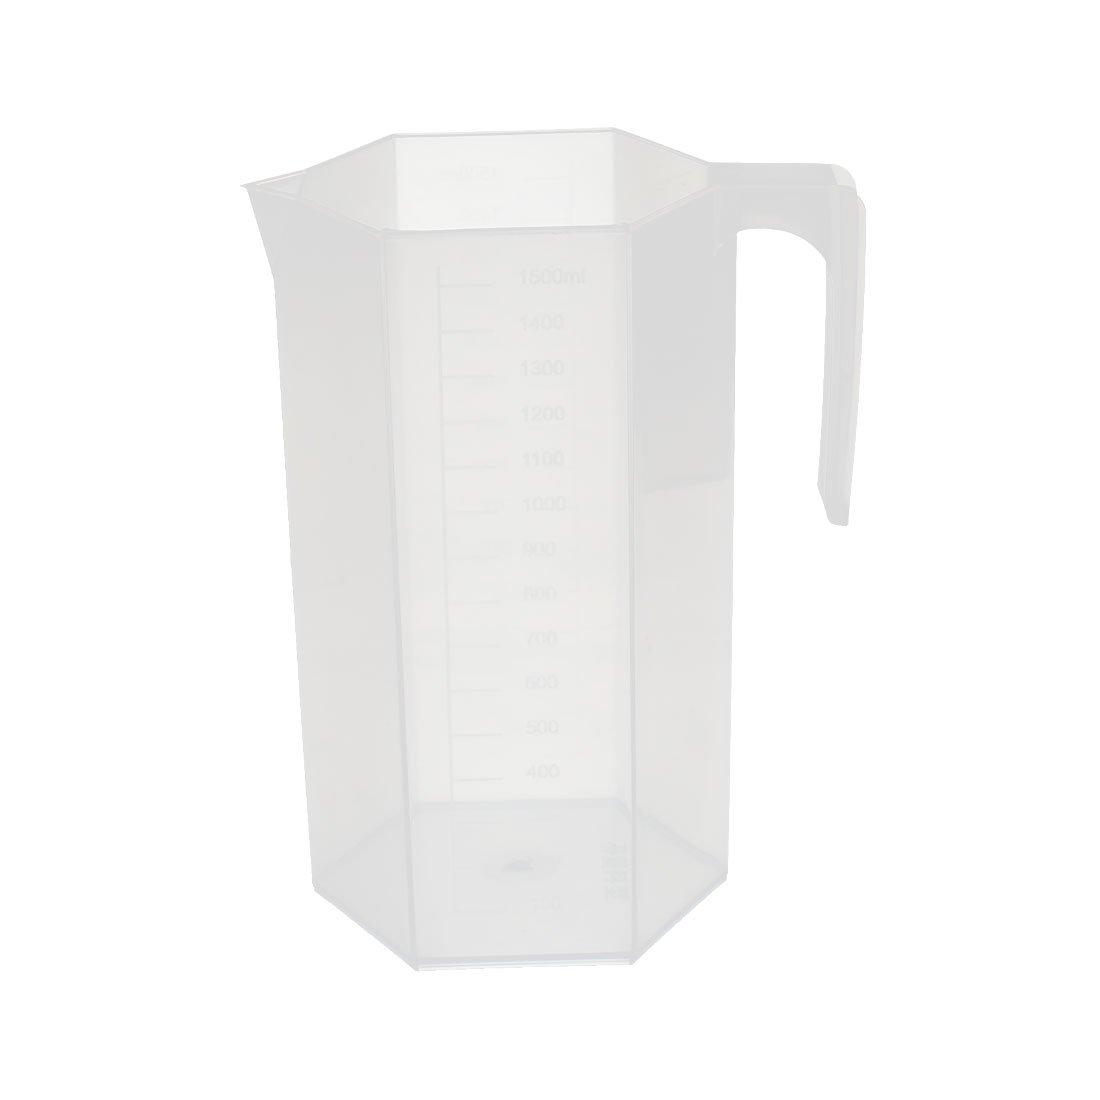 uxcell Kitchen Lab 1500mL Square Plastic Measuring Cup Jug Pour Spout Container